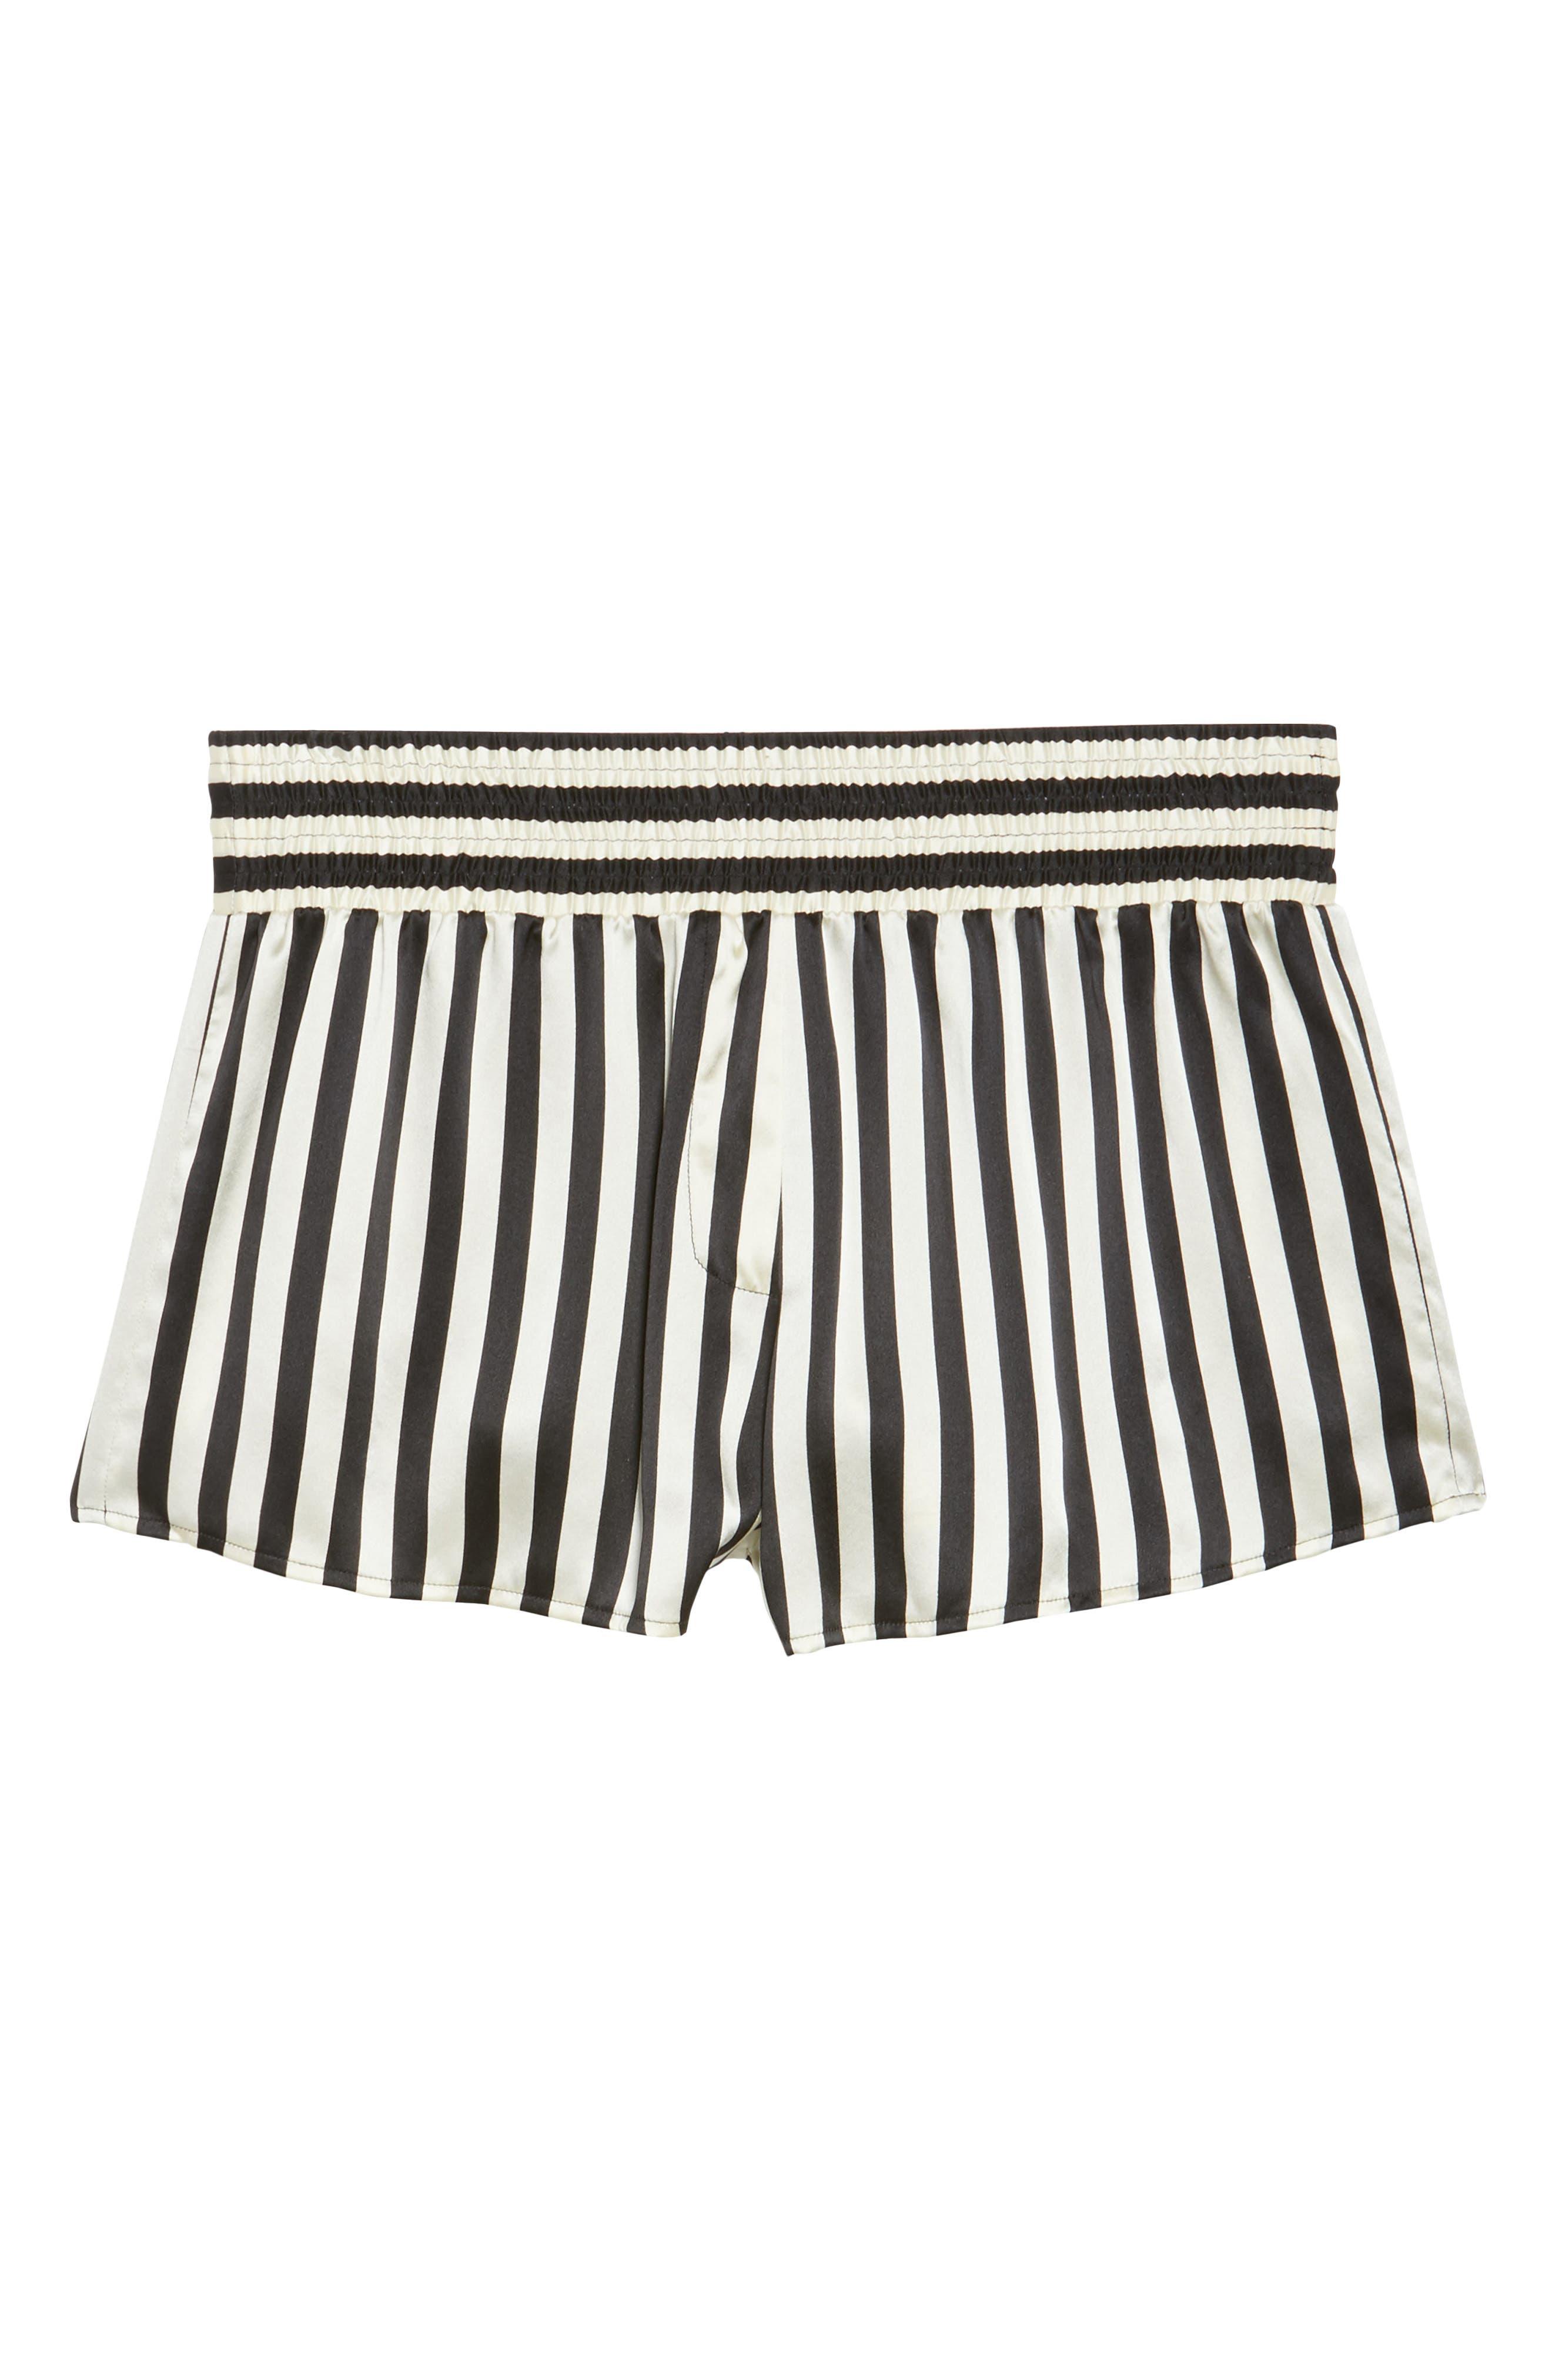 x Amanda Fatherazi Mini Mask Corey Stripe Silk Shorts,                             Alternate thumbnail 6, color,                             004